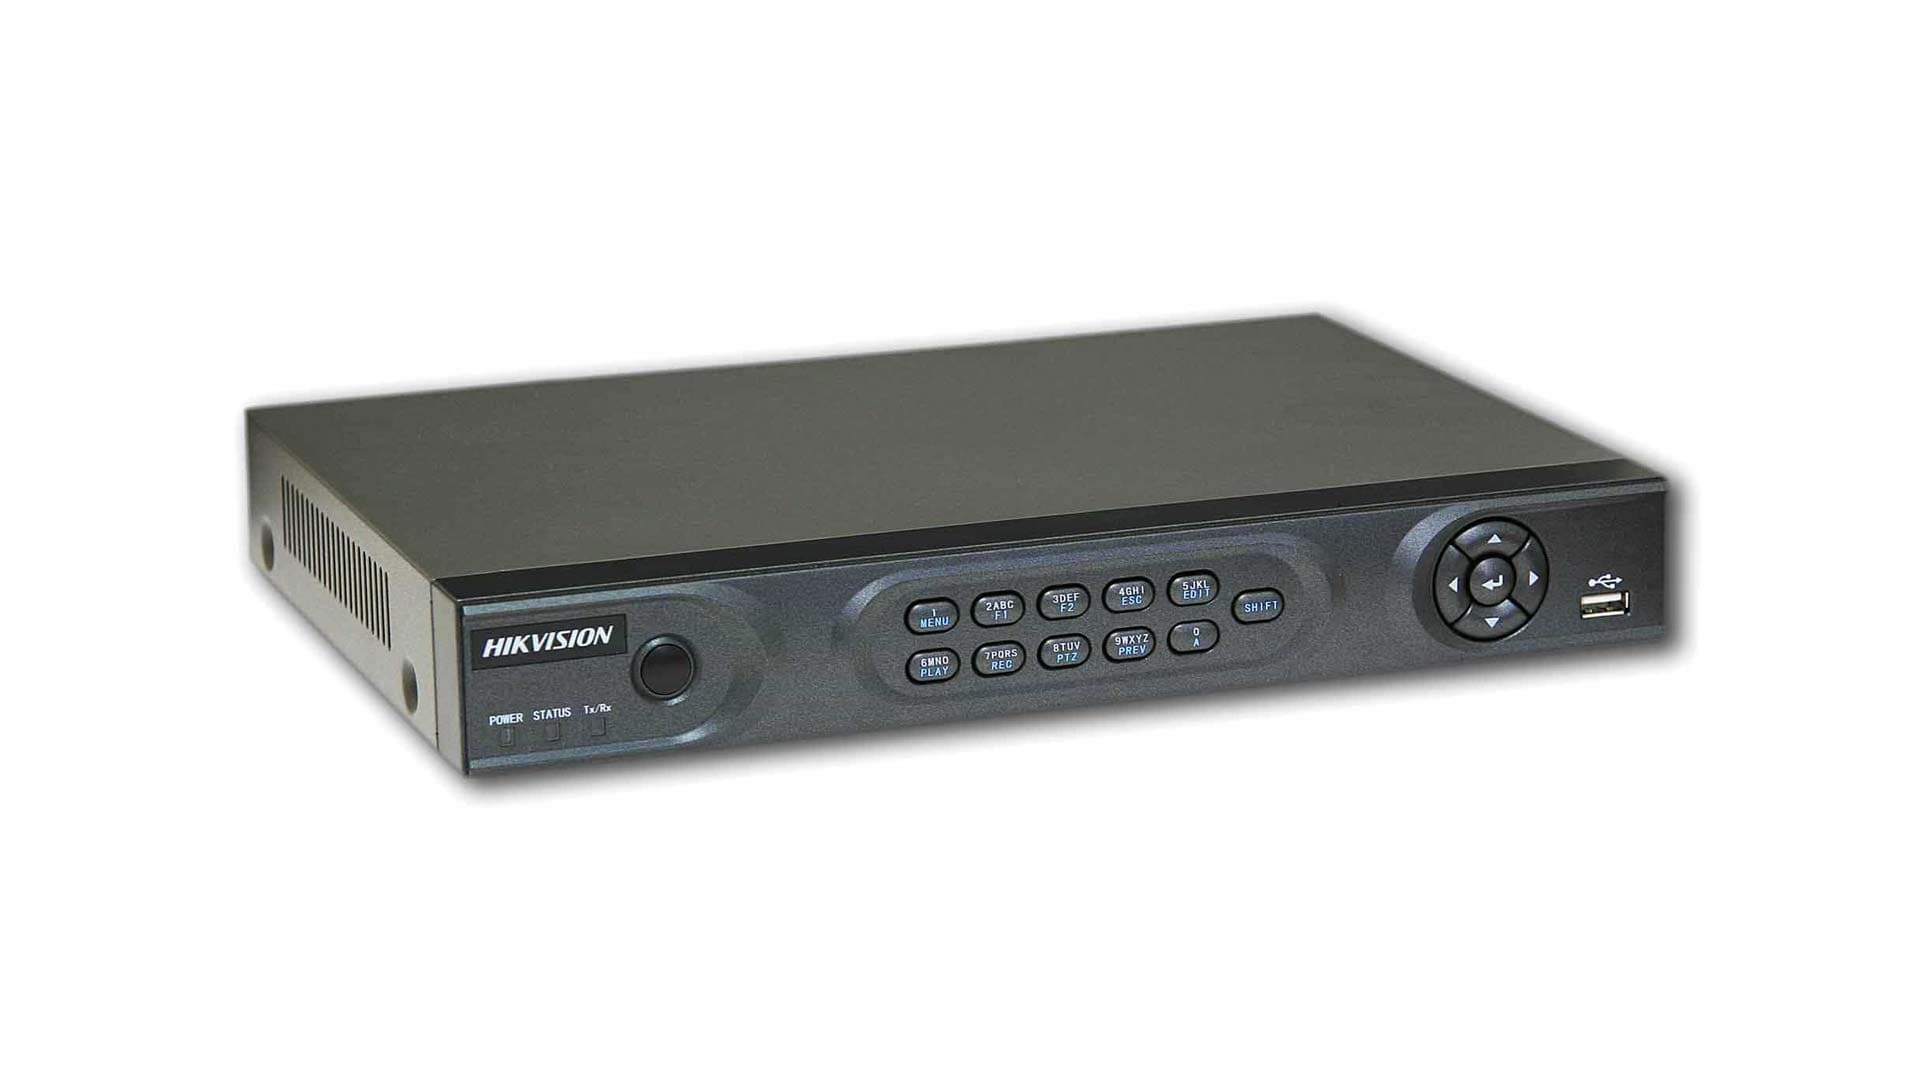 Hikvision DS-7204HVI-ST: инструкция (manual) и характеристики